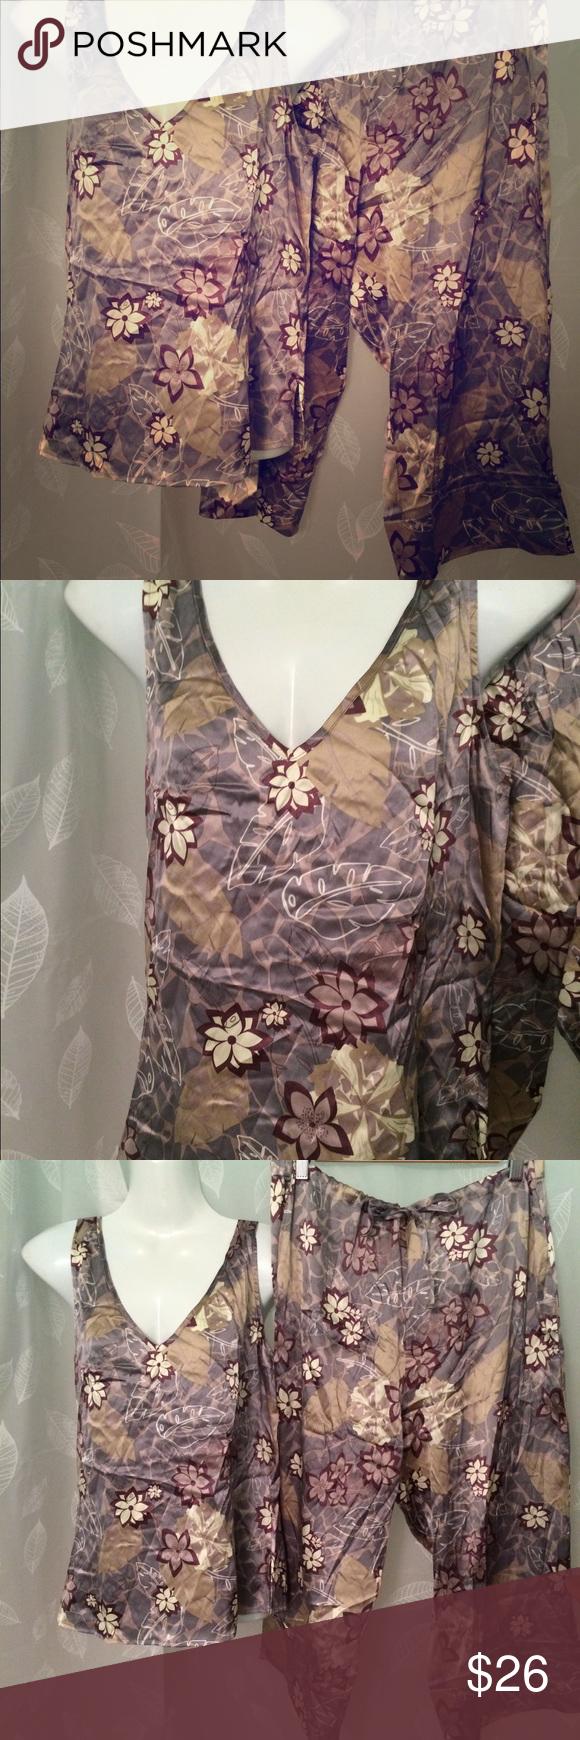 Tropical leaf print. Pale colors. Silk Spandex blend. Very good condition. cabela s  Intimates   Sleepwear Pajamas 88626b163